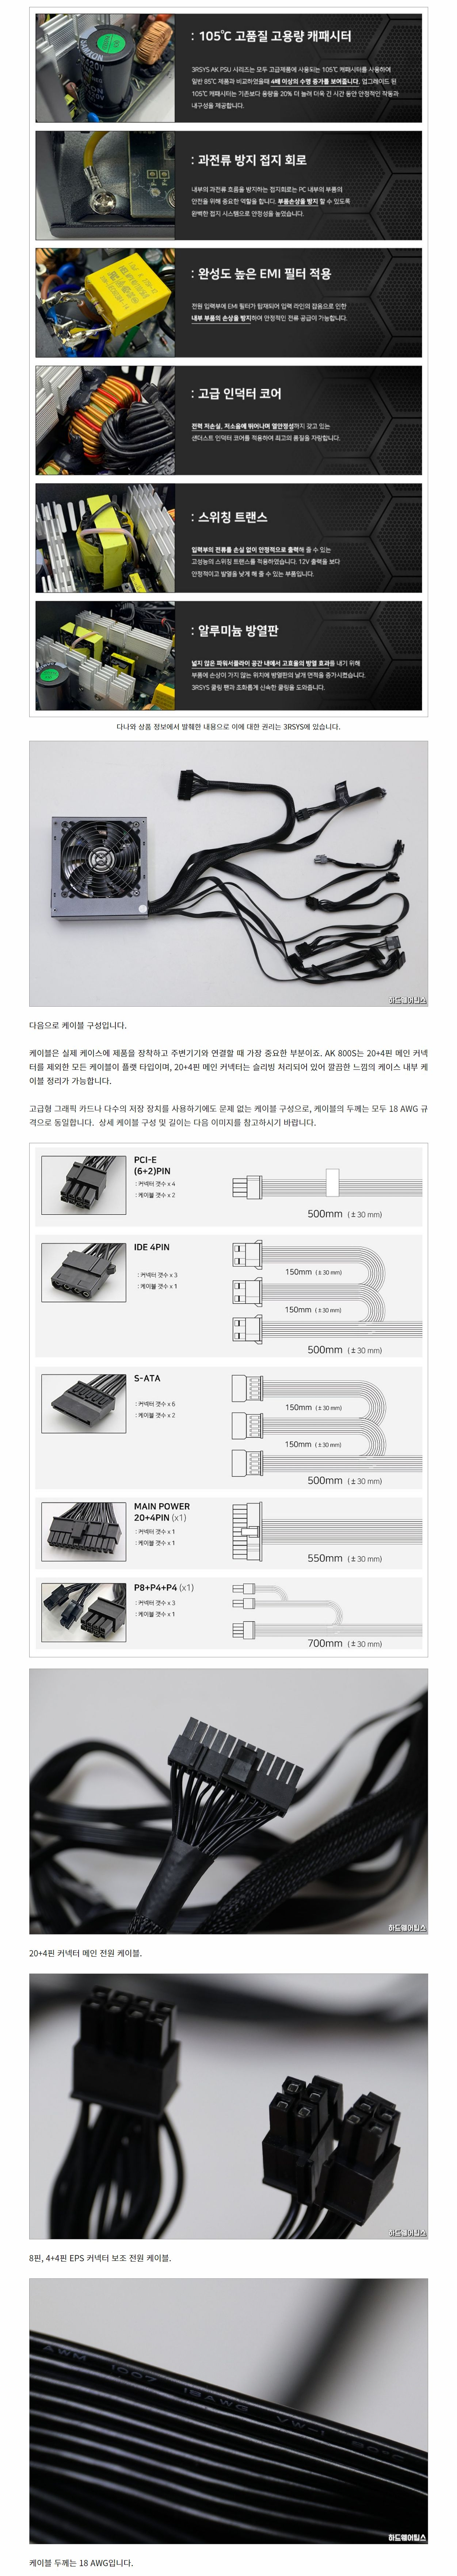 6- 3RSYS AK 800S 80 PLUS STANDARD 230V EU.jpg